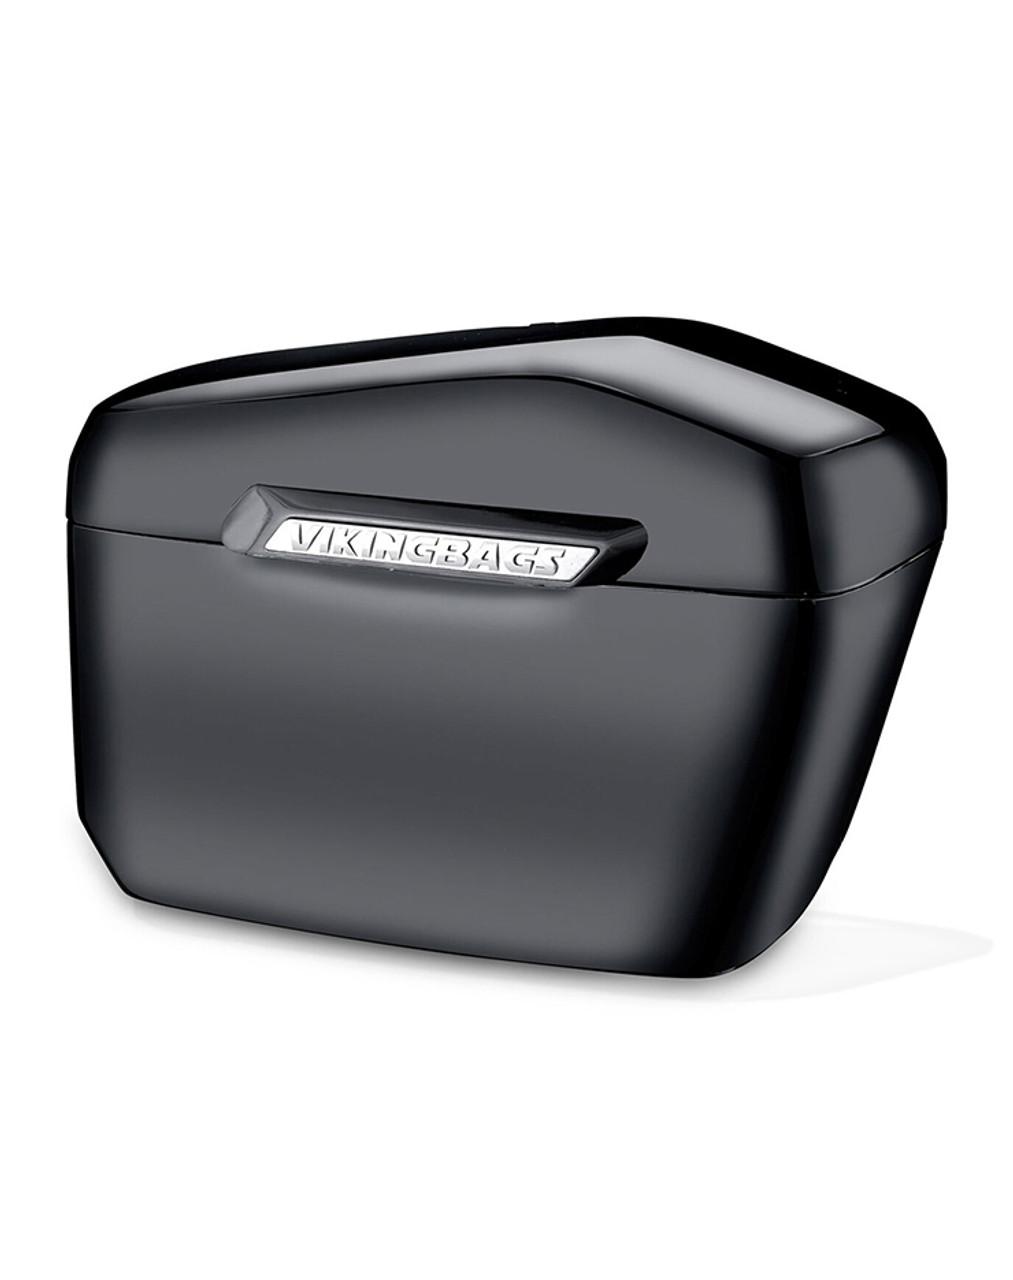 Honda 750 Shadow Aero Viking Lamellar Large Black Hard Saddlebags Main Bag View